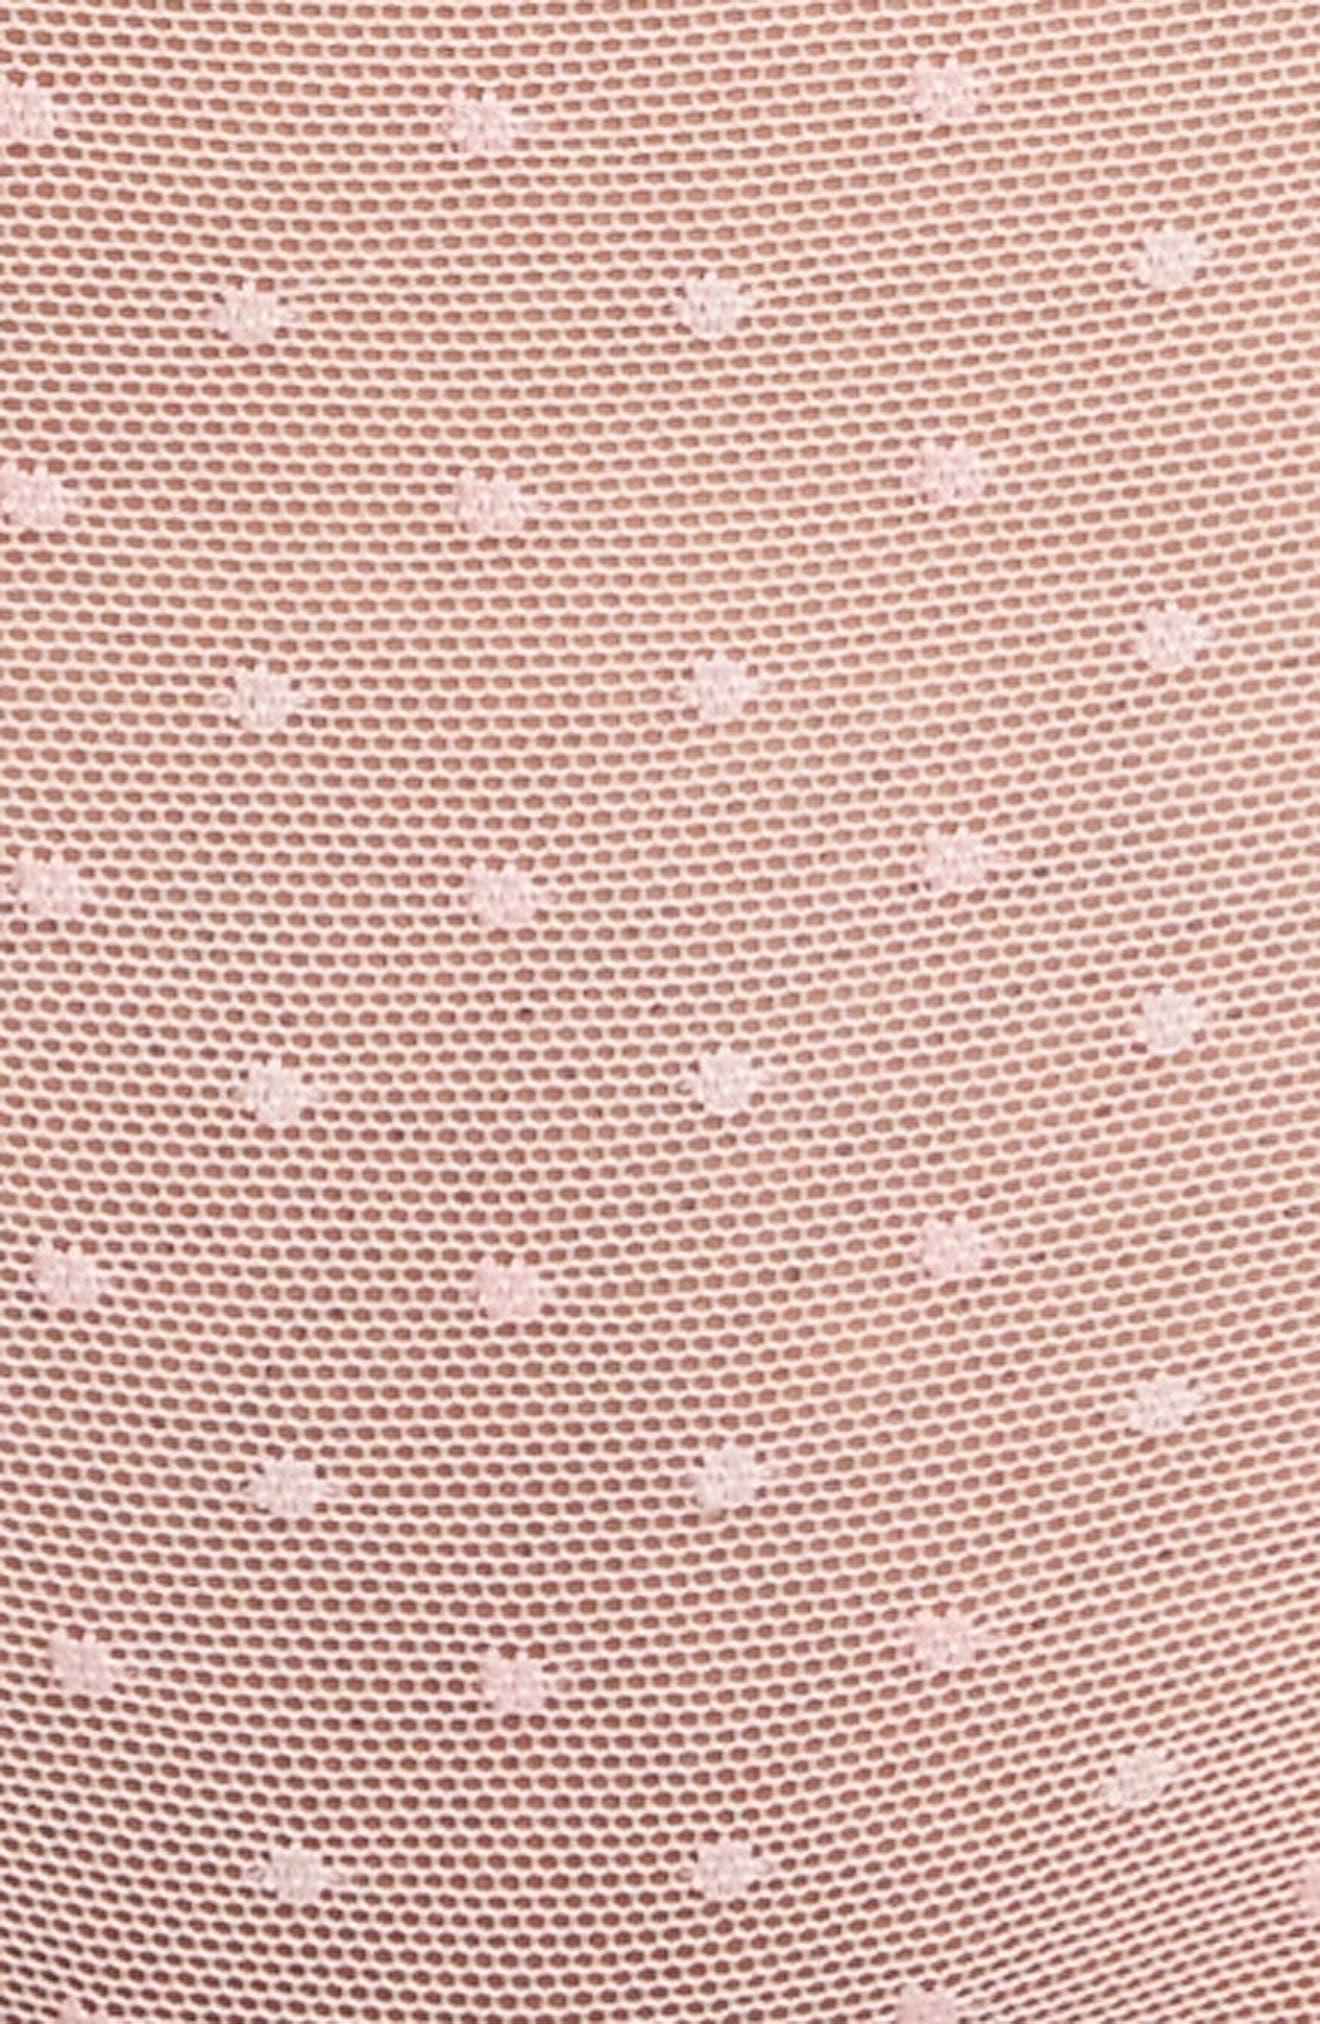 Swiss Dot Bikini,                             Alternate thumbnail 9, color,                             Candy Pink